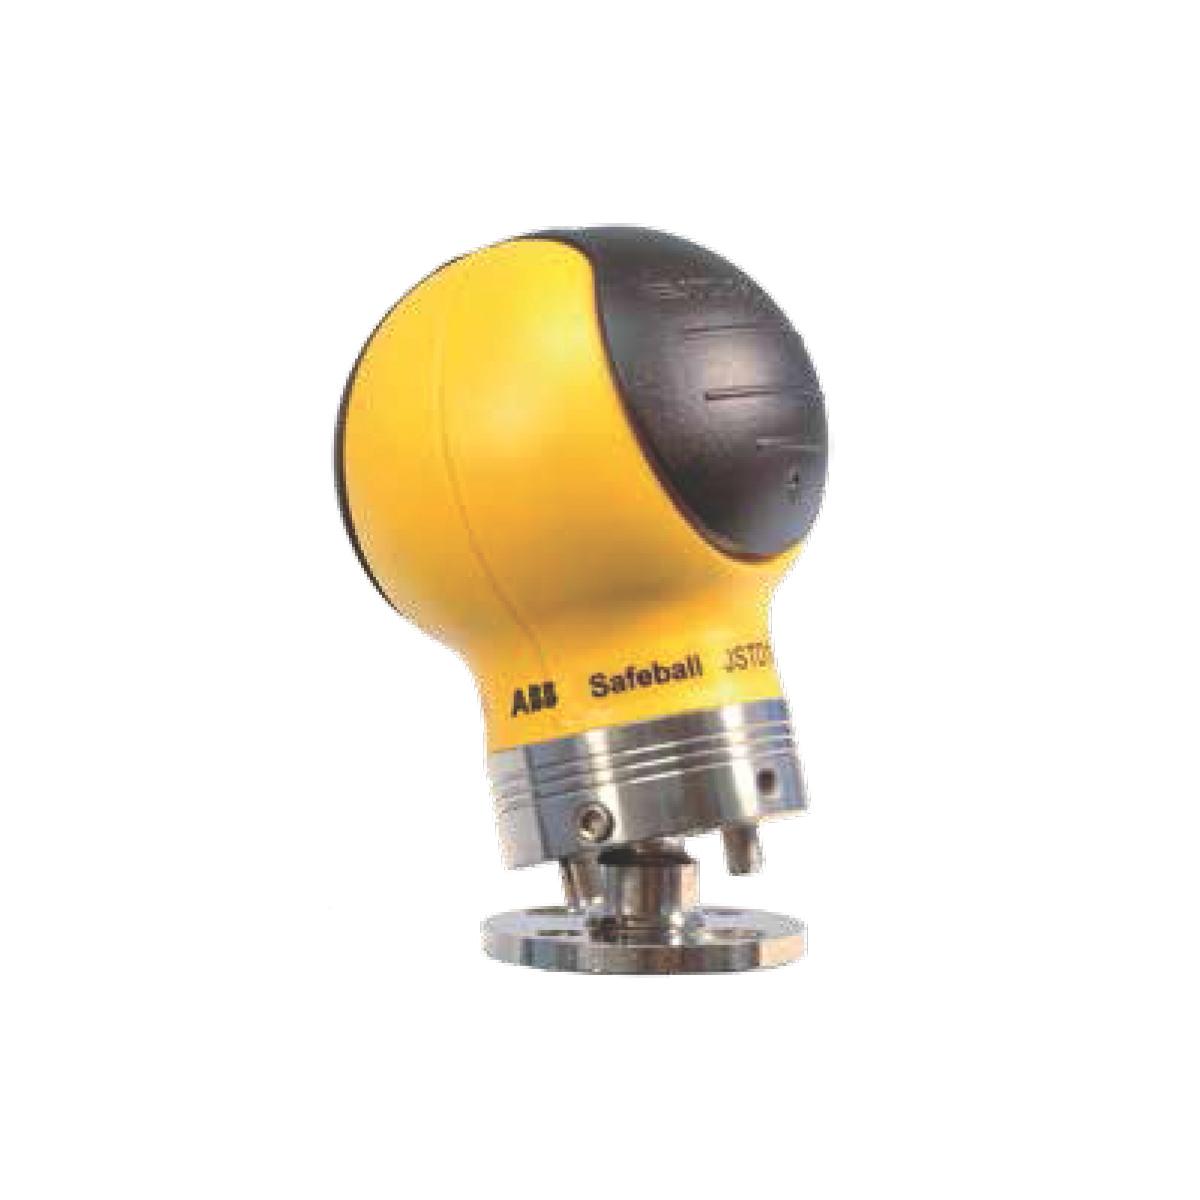 ABB 2TLA020007R3400 Safeball